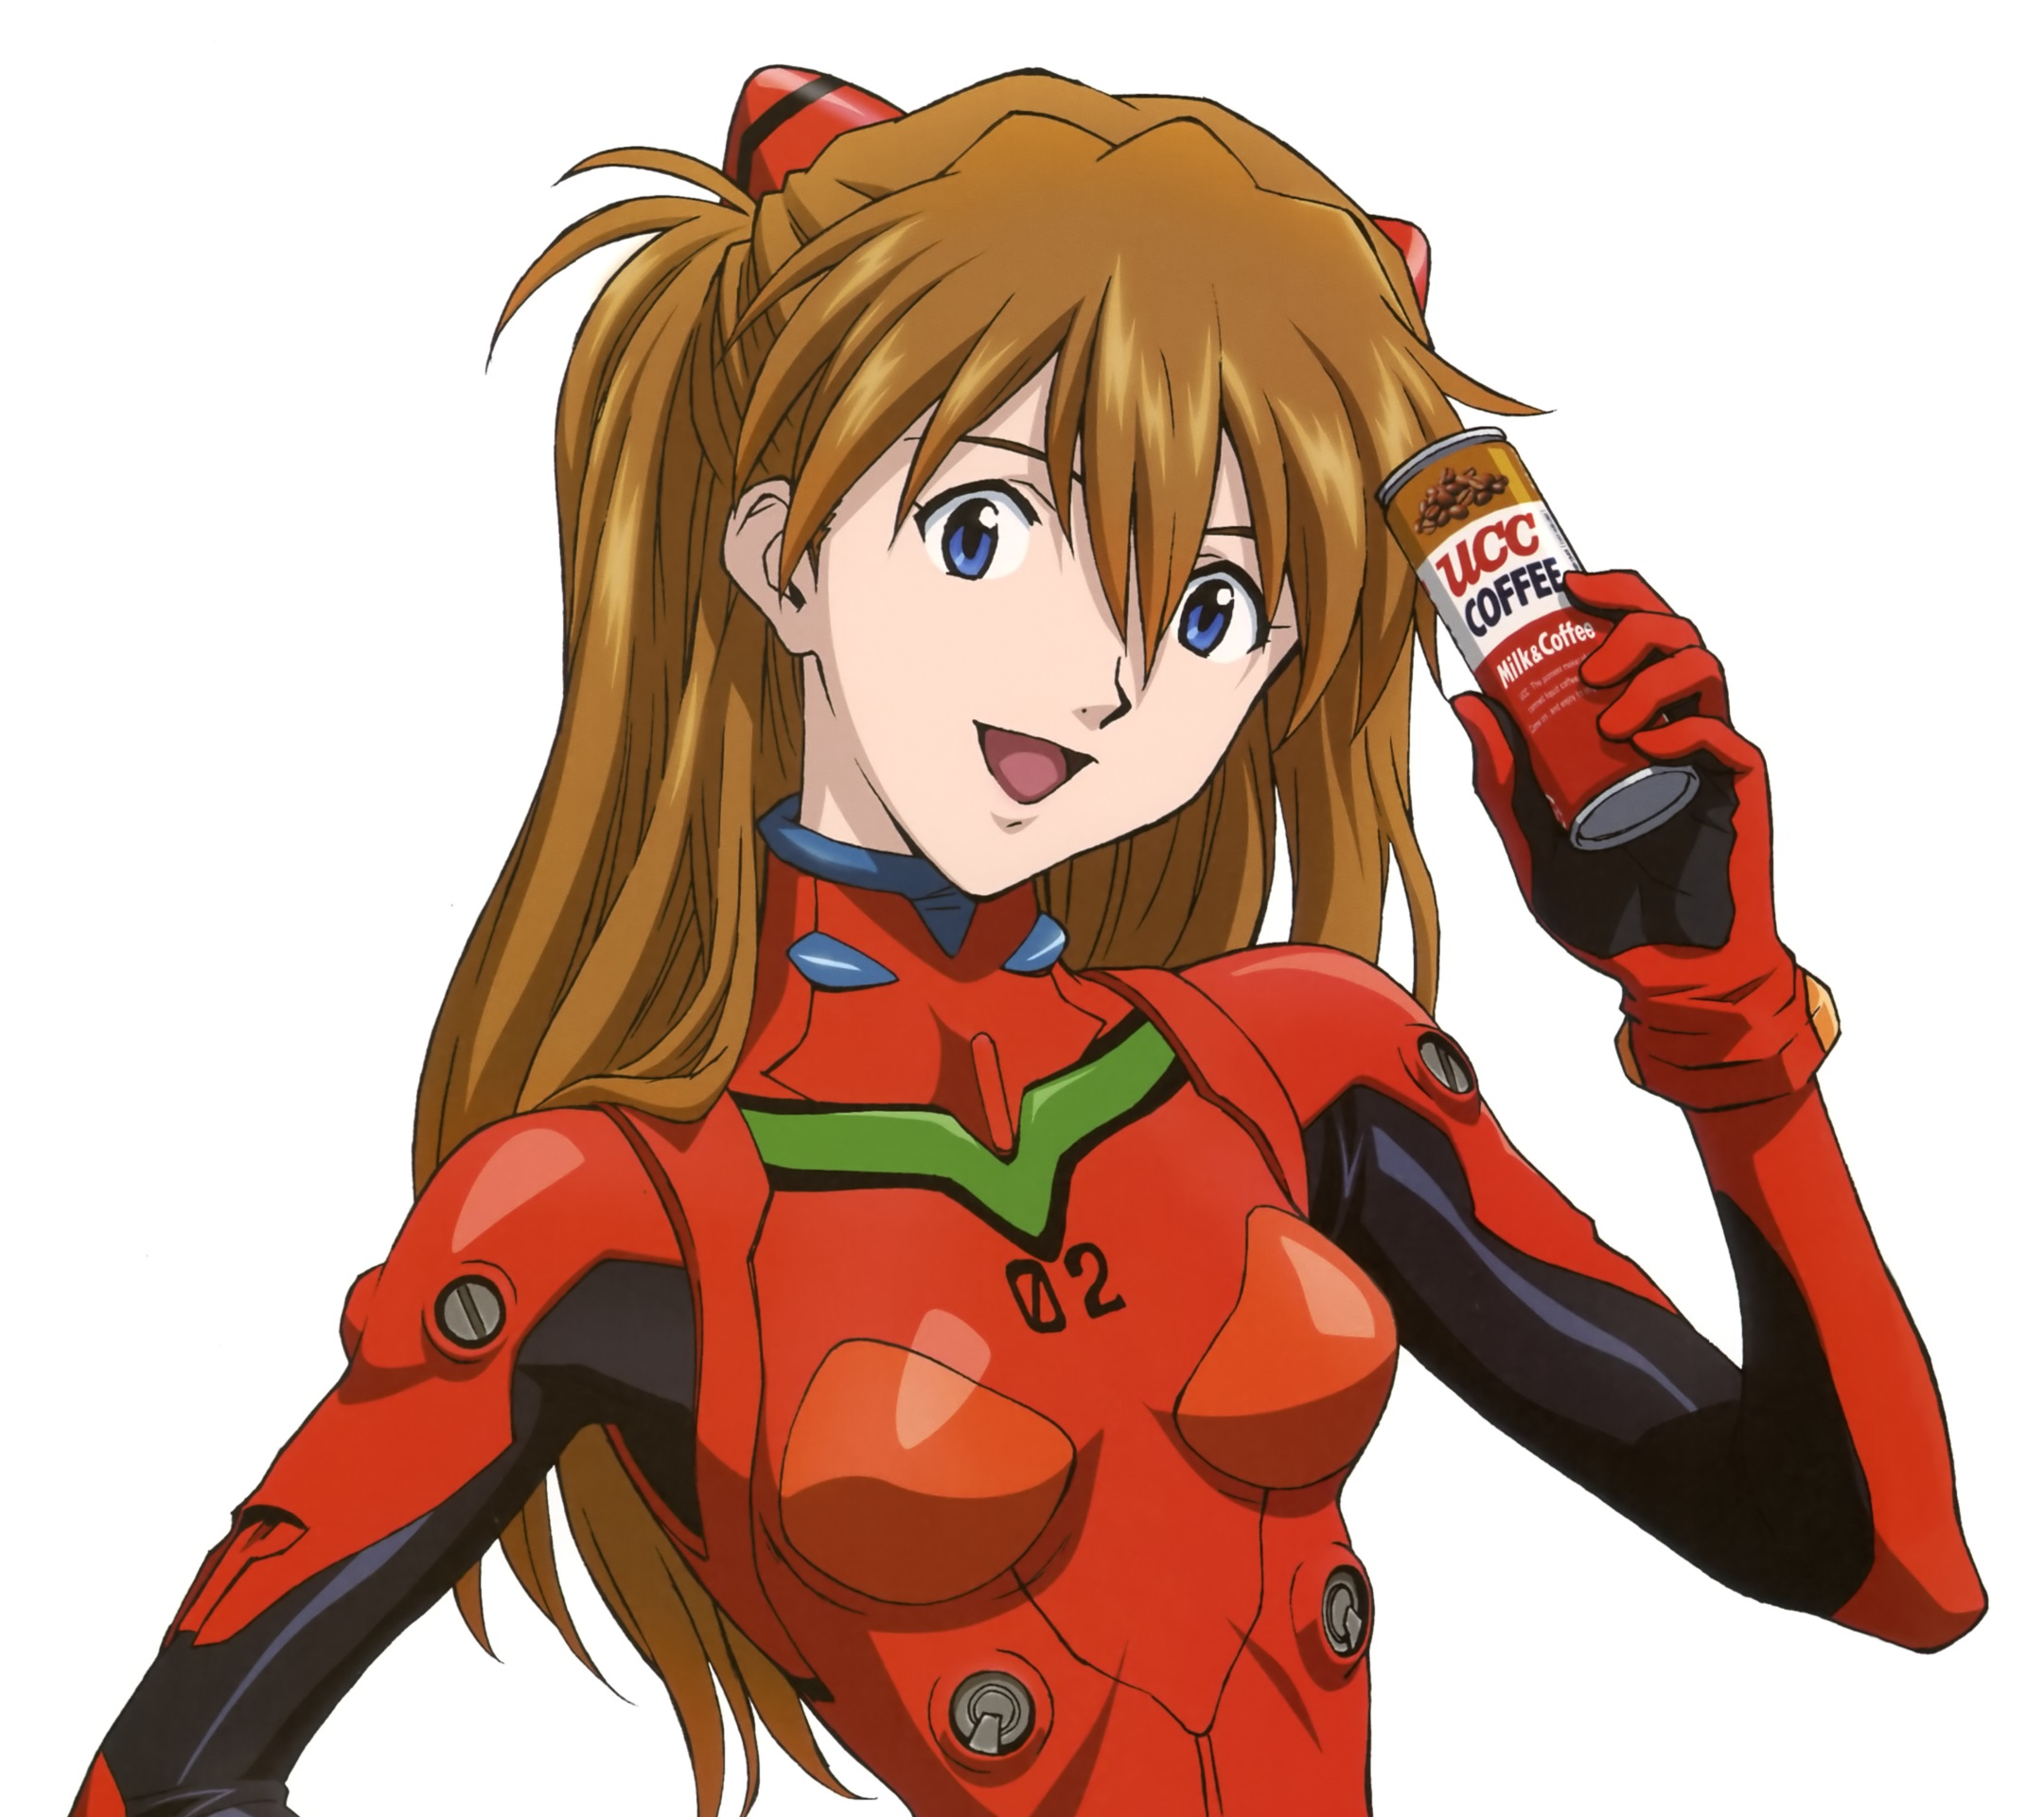 Neon Genesis Evangelion Asuka Langley Soryu.Magic THL W8 wallpaper 1080×1920 - Kawaii Mobile